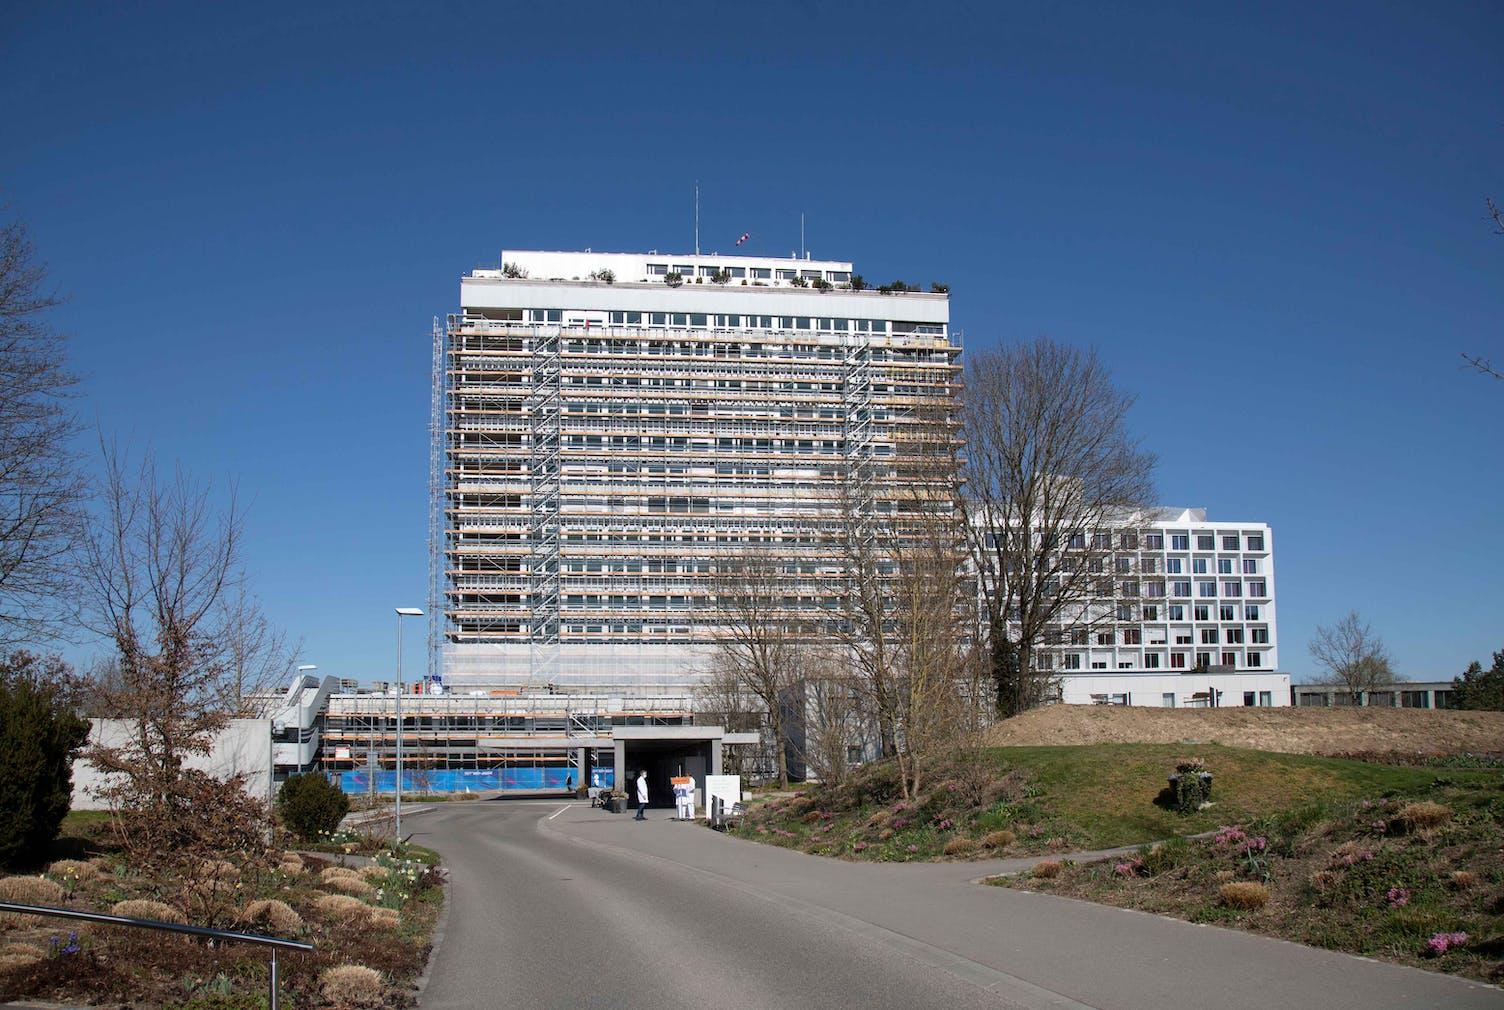 Spital Frauenfeld